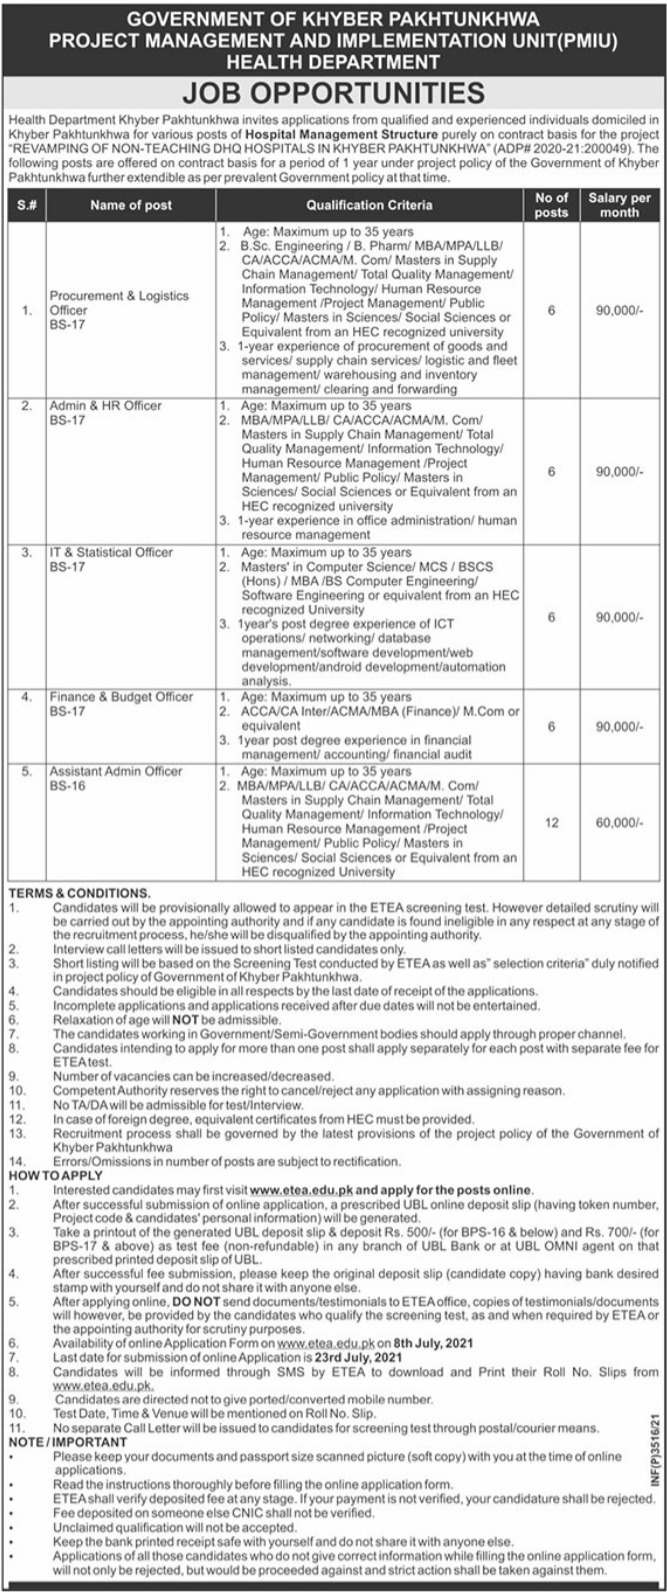 KP Health Department Latest Jobs 2021